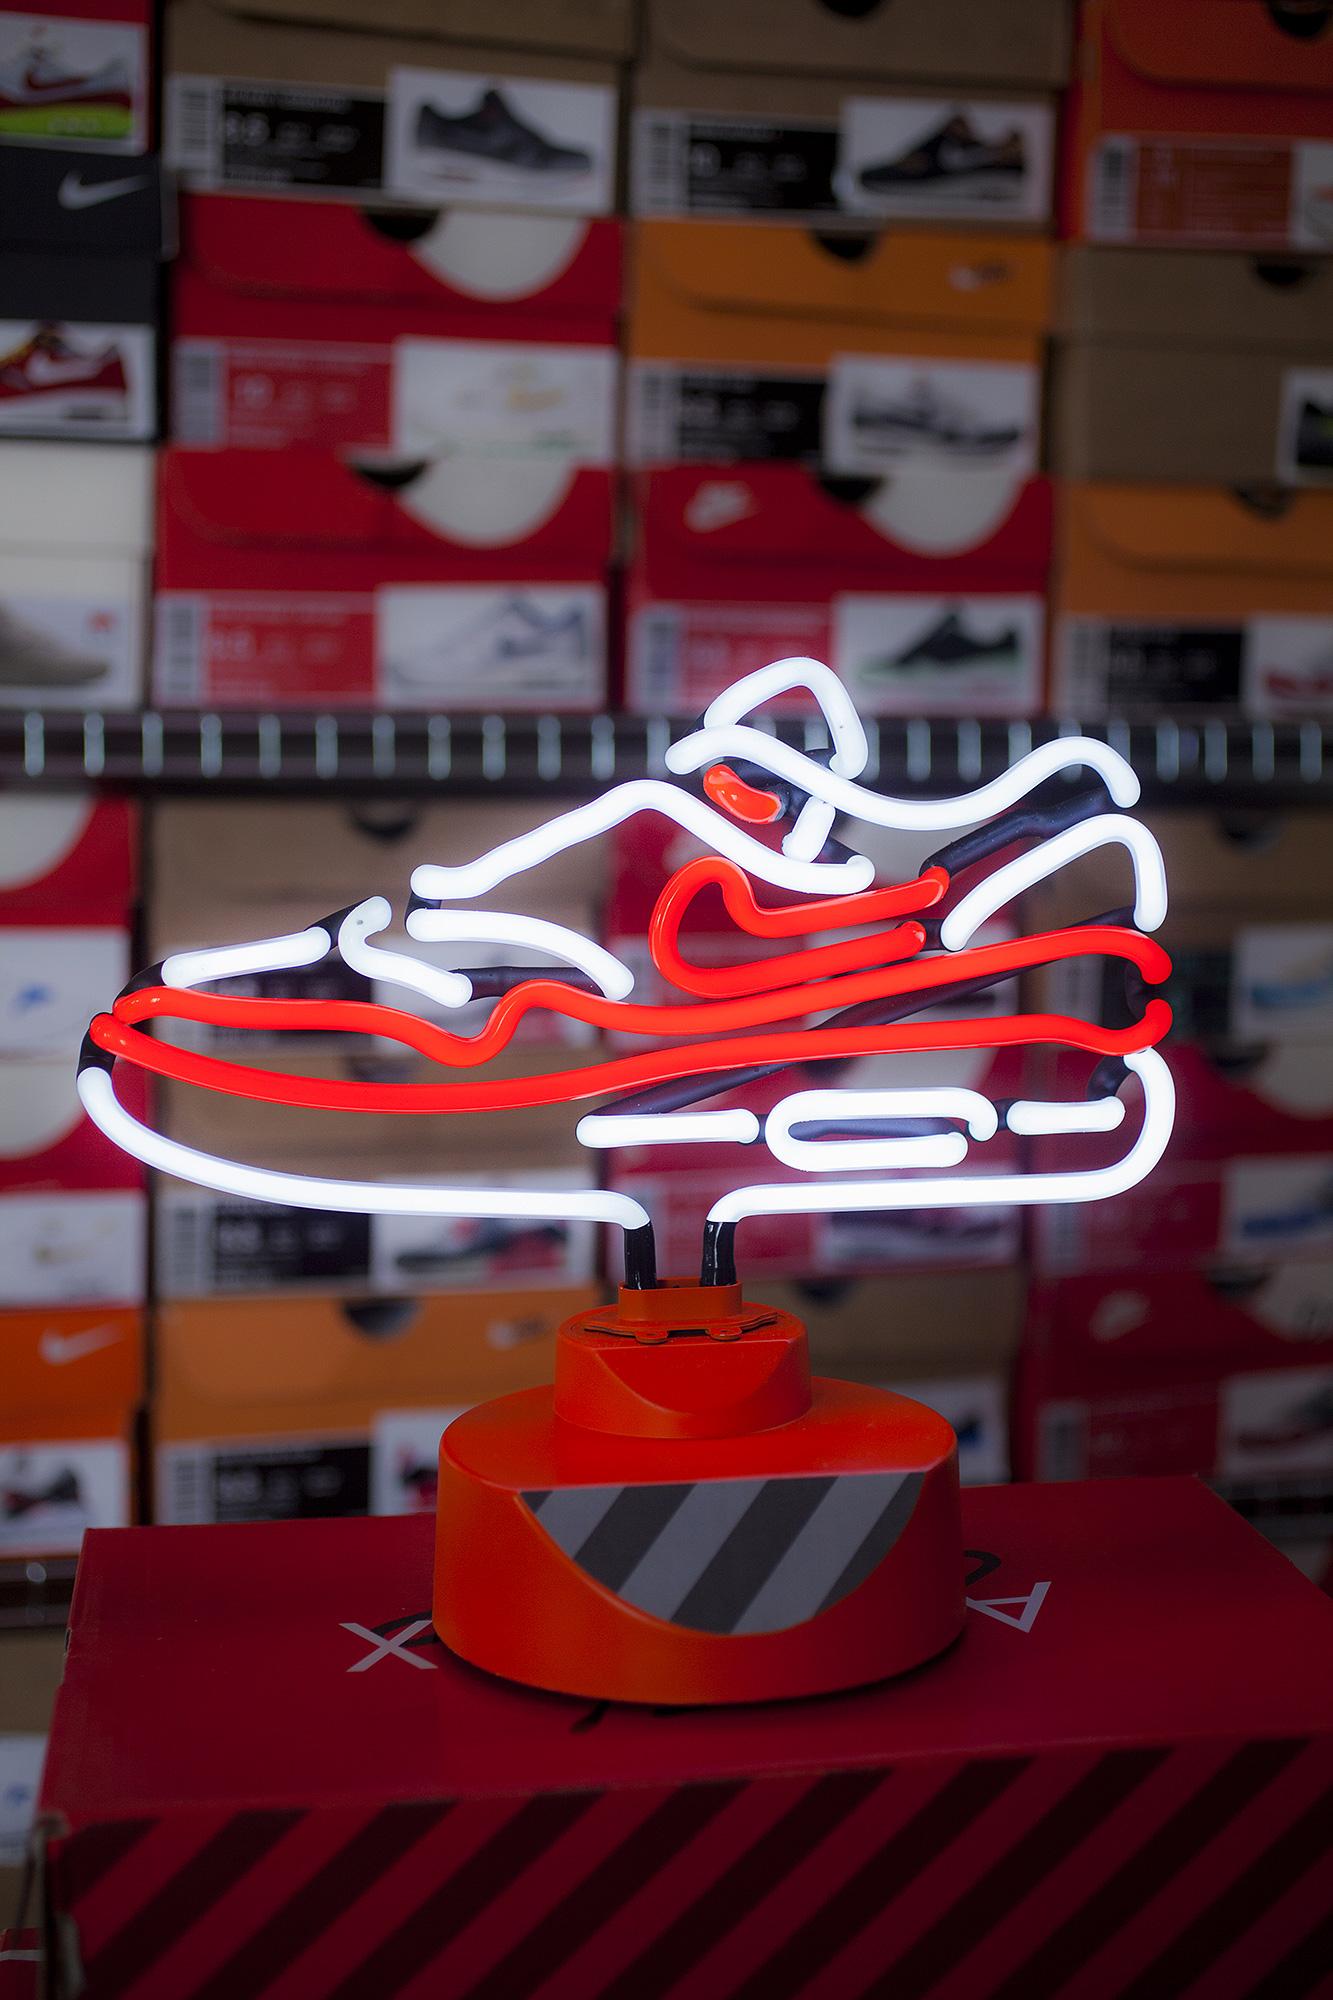 Lampes Neon : Lampe neon nike air max og sneakers addict